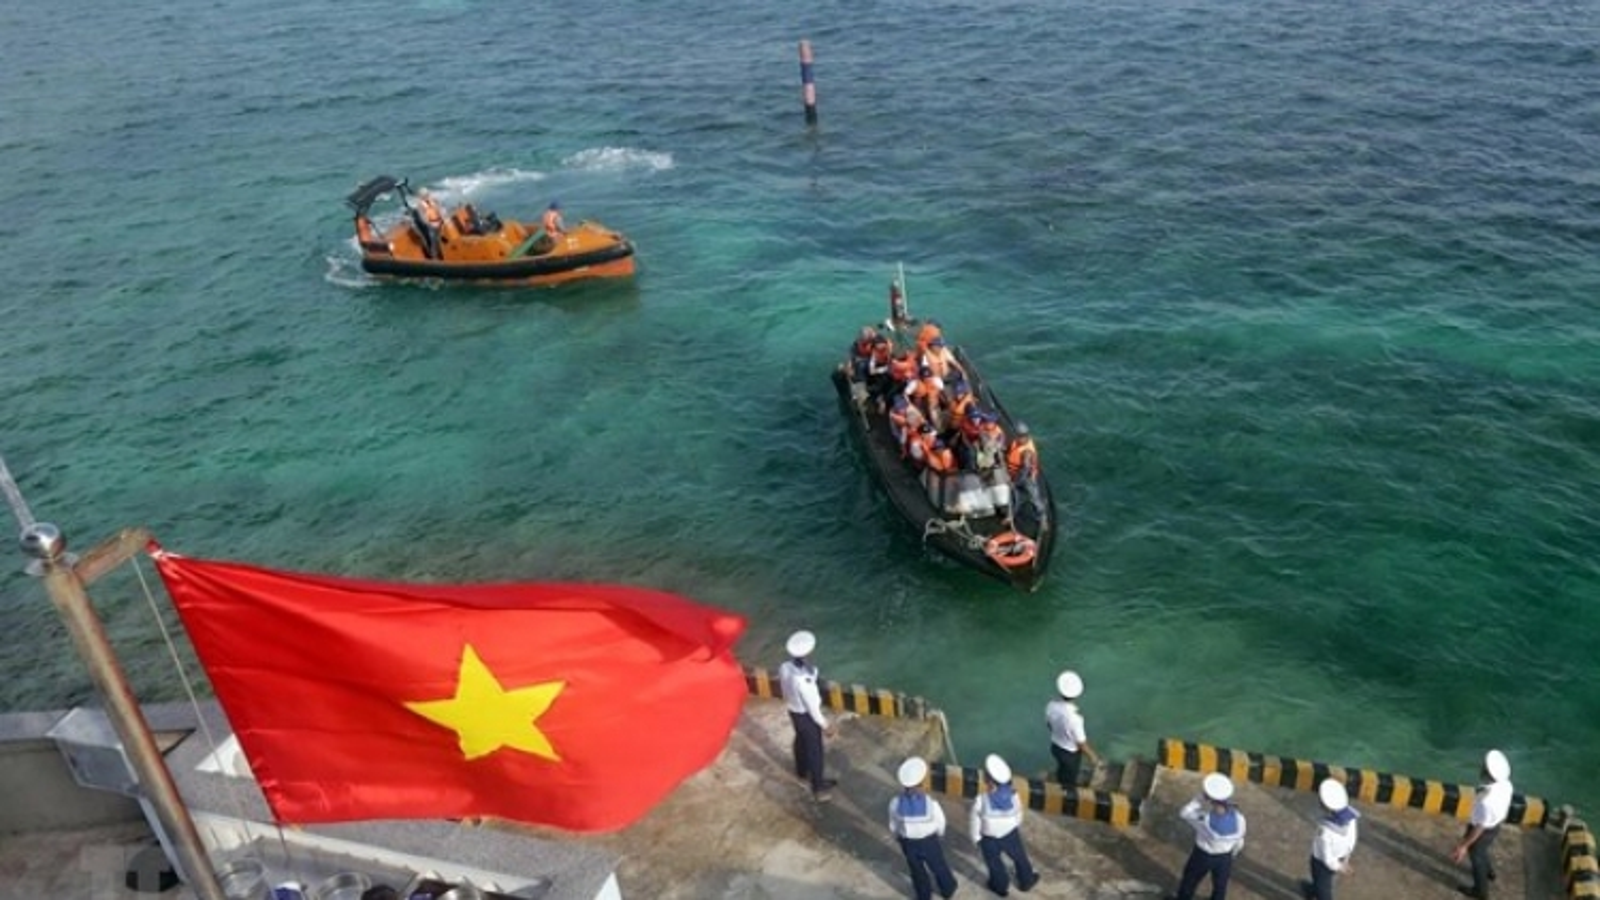 UNCLOS 1982 promotes development cooperation at sea